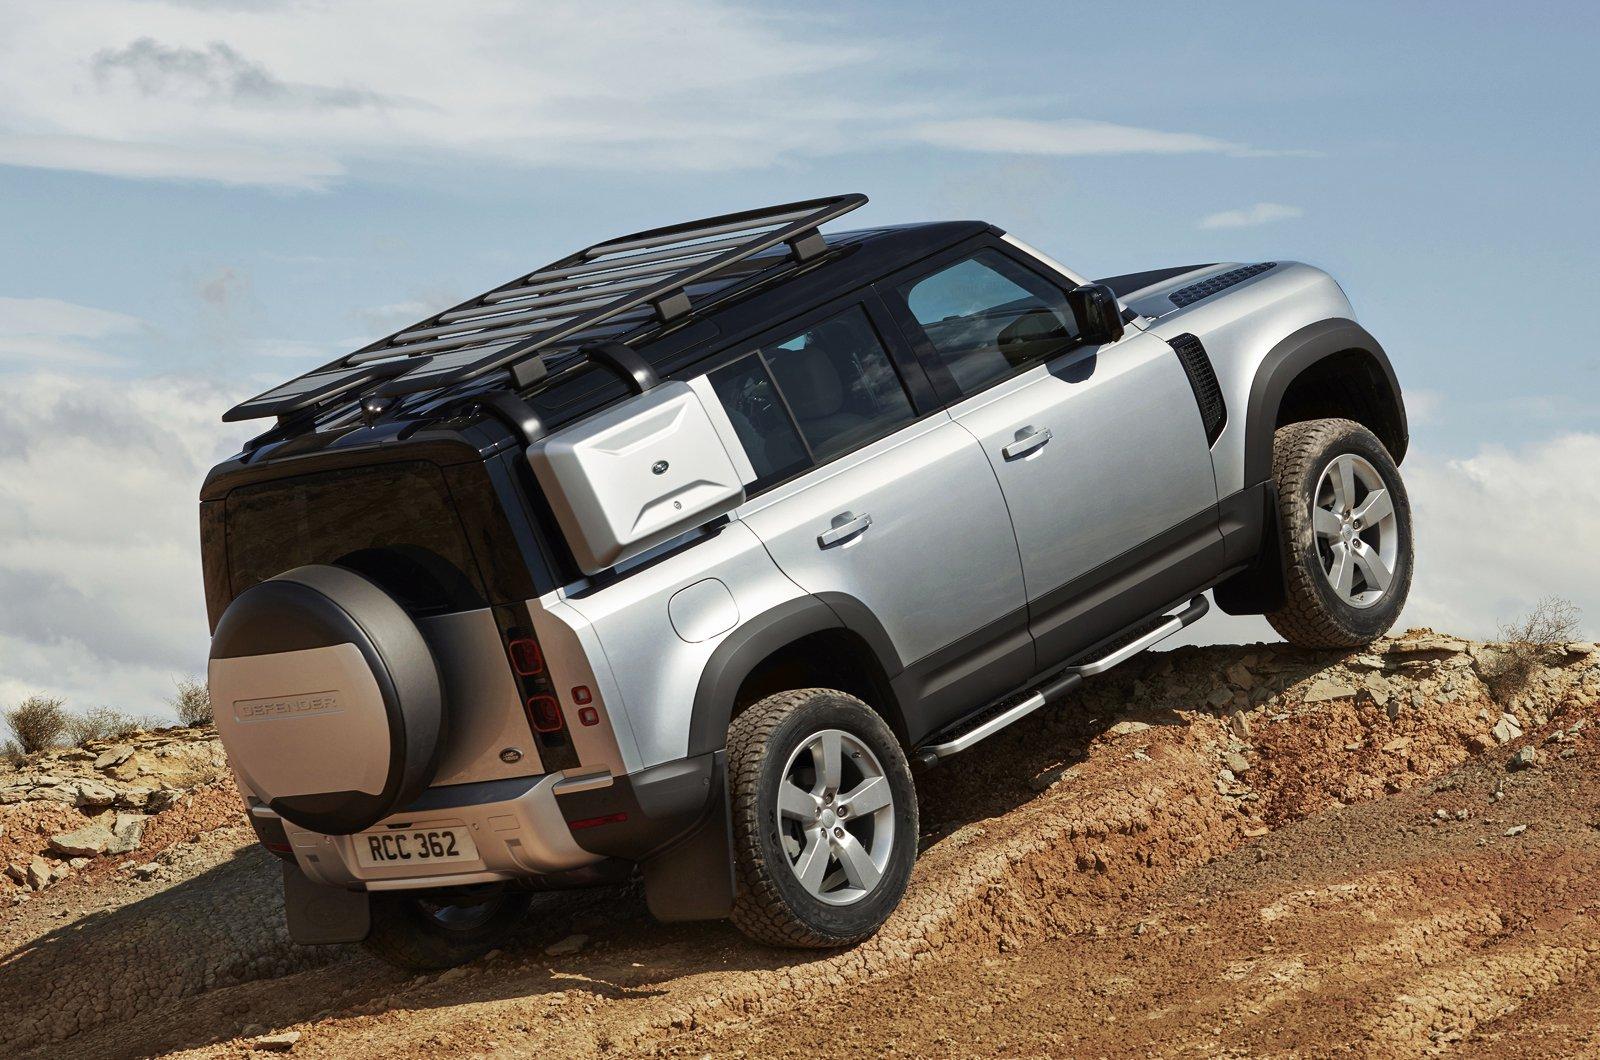 2020 Land Rover Defender 110 rear